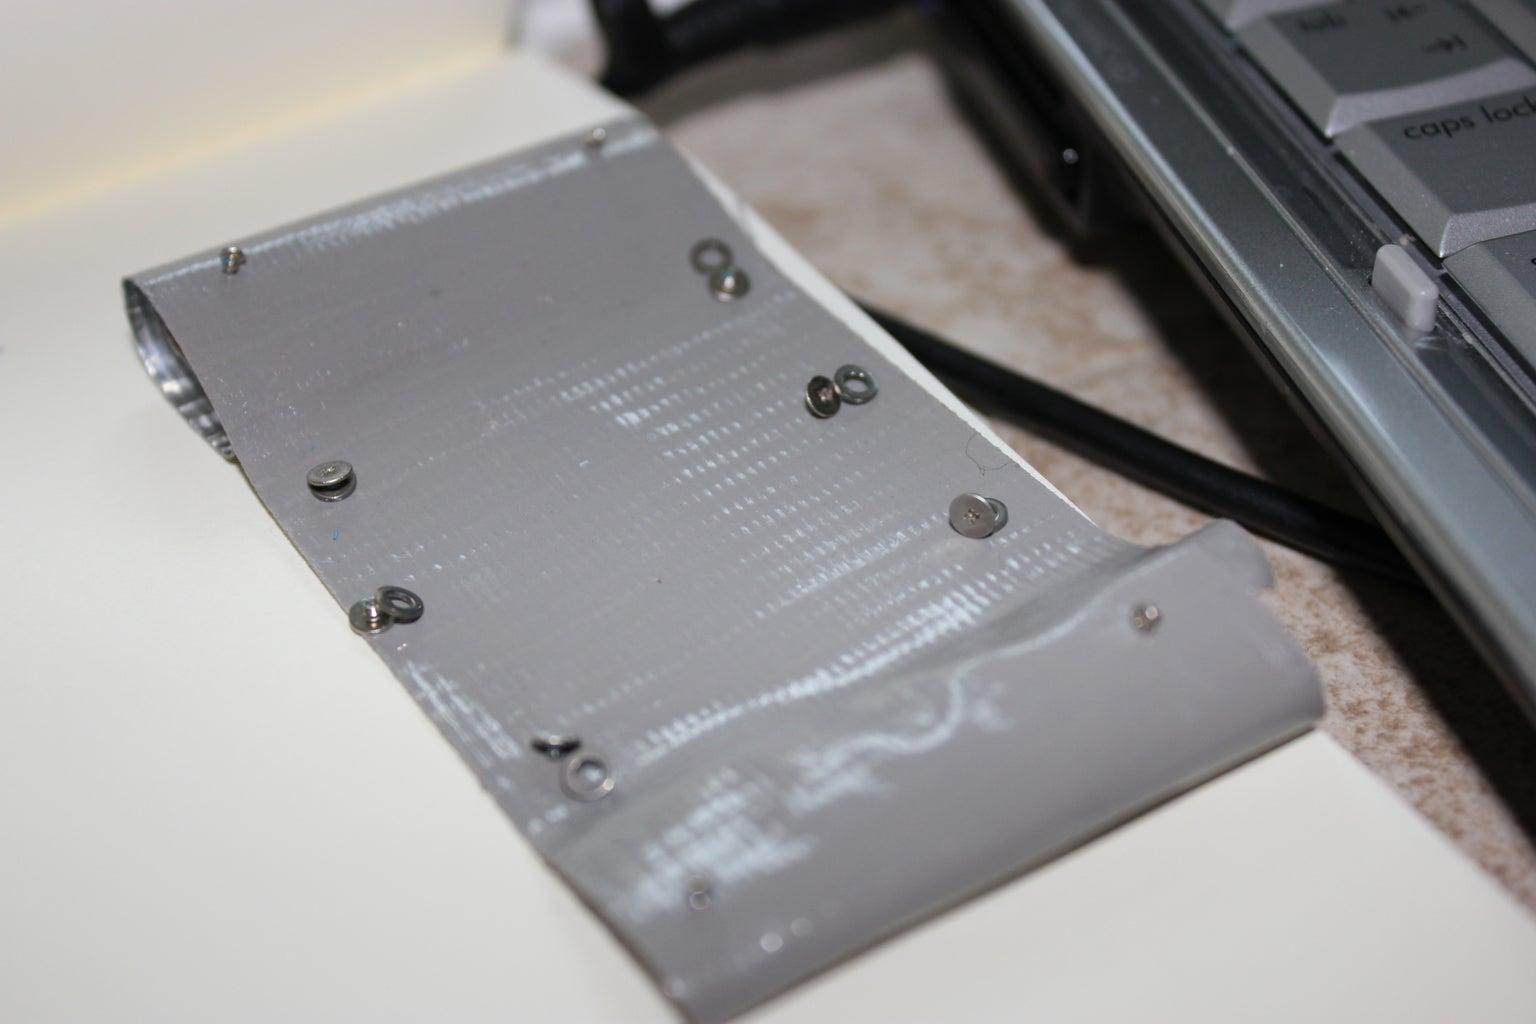 Removing More Screws